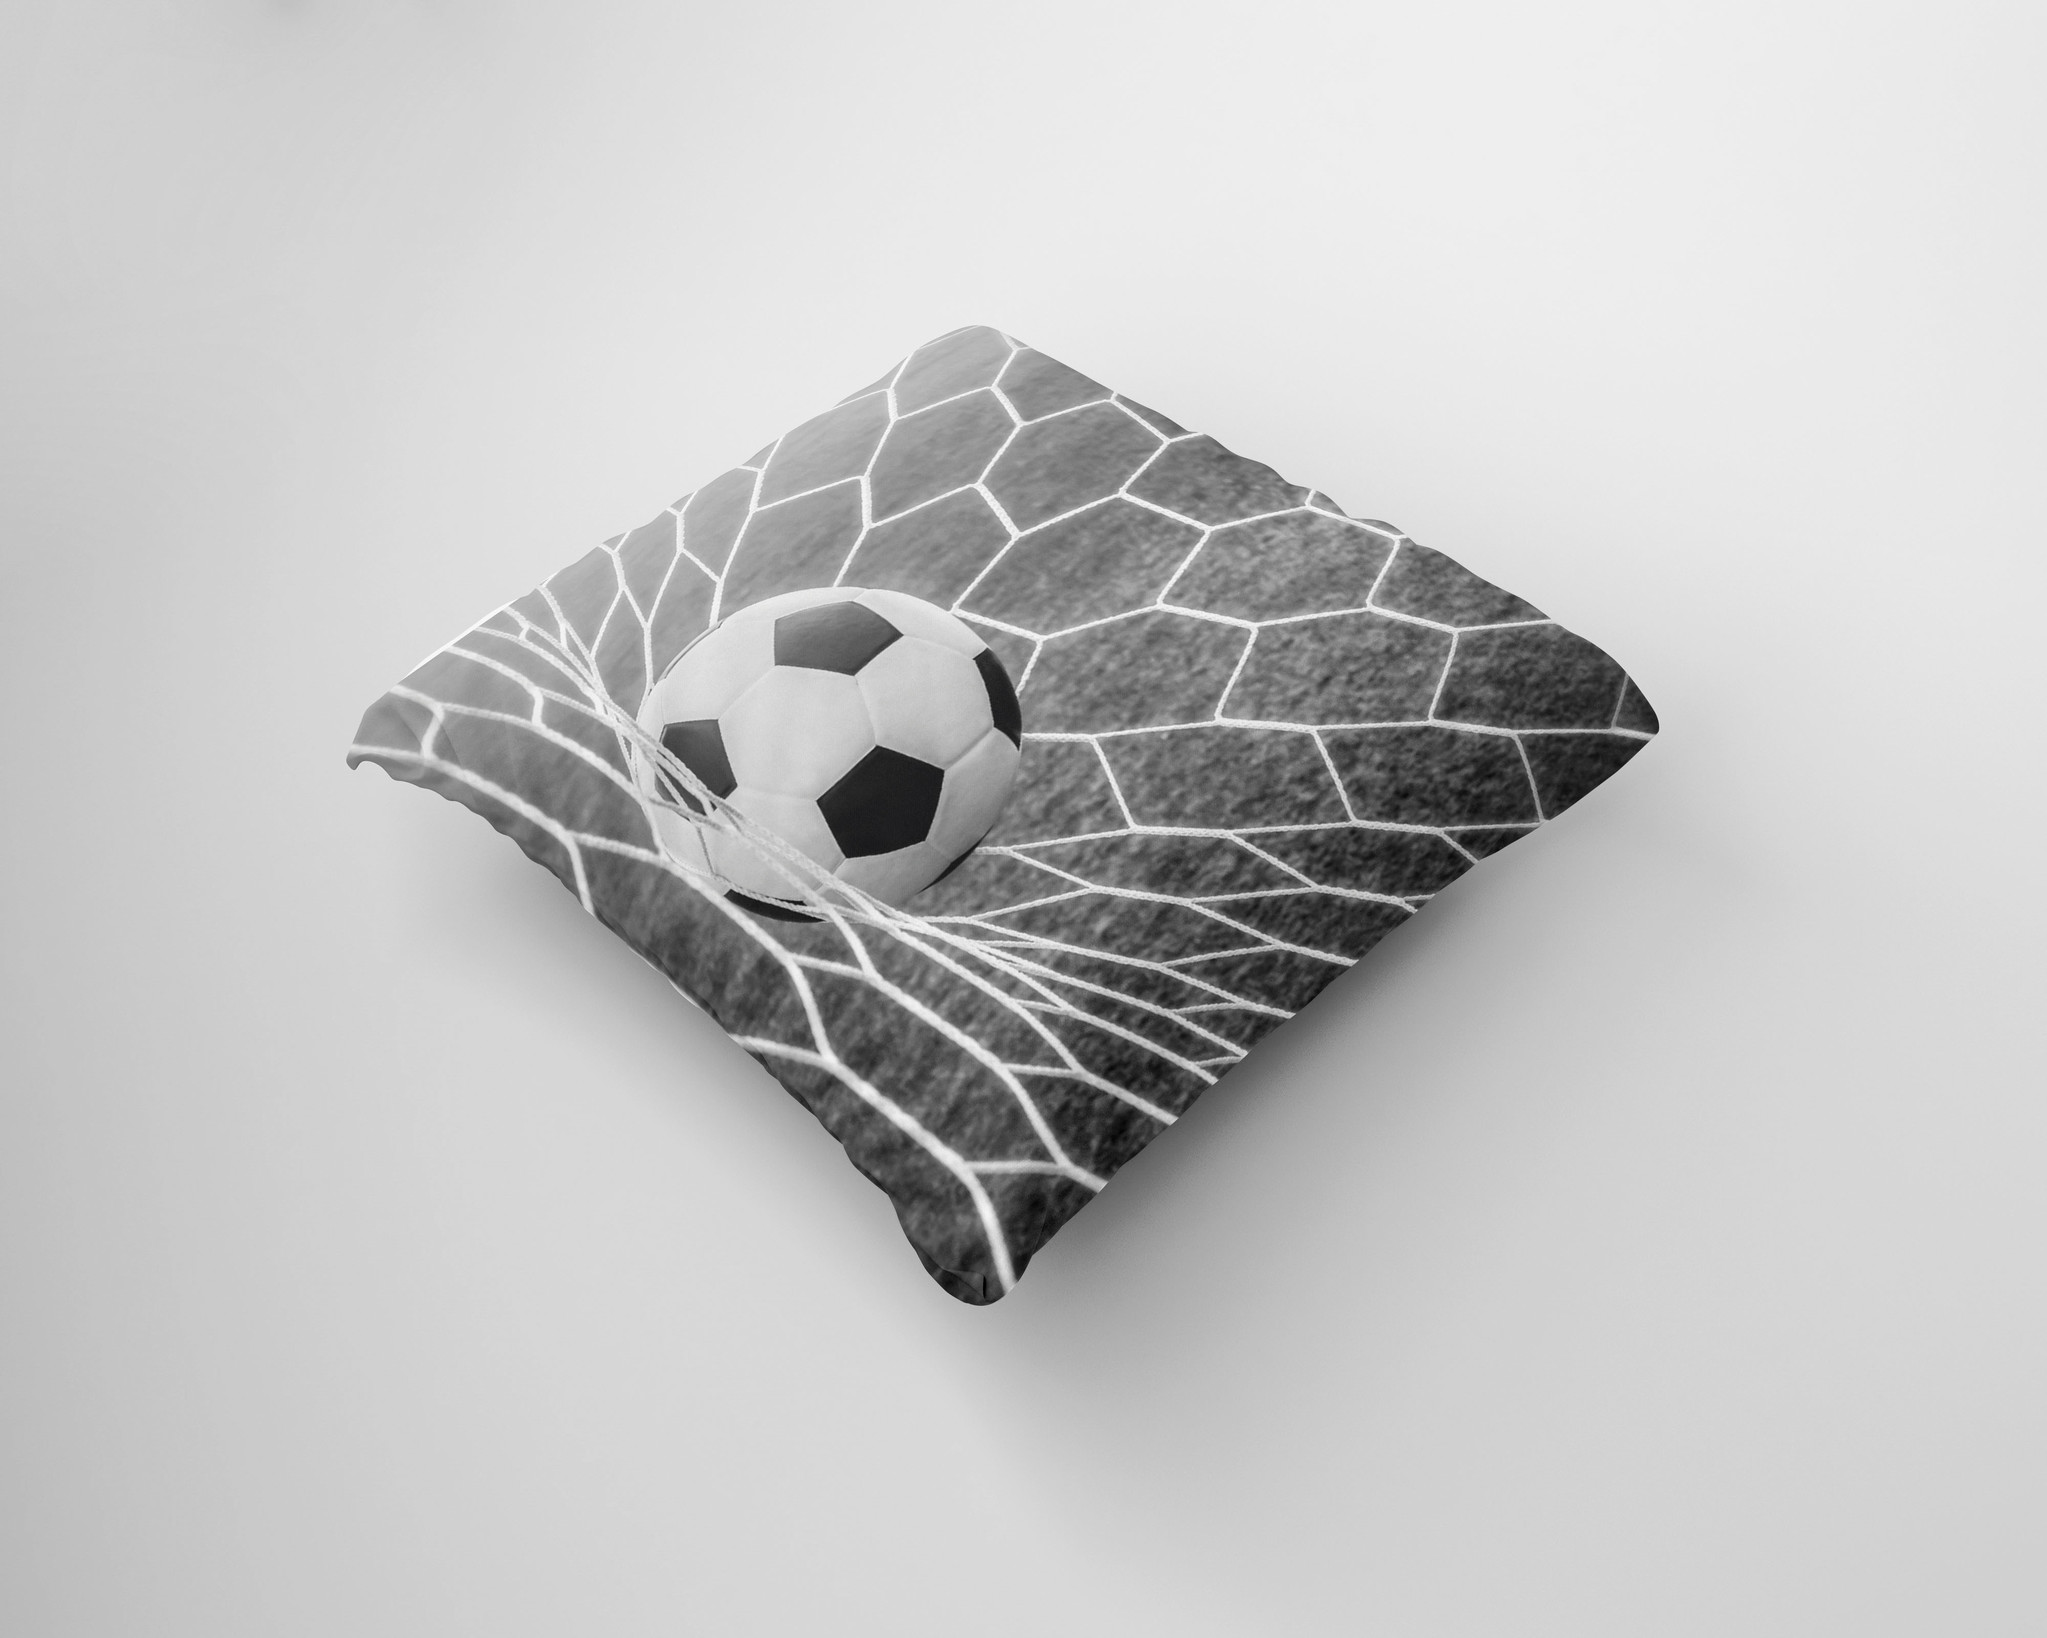 Kussen voetbal in net zwart/wit